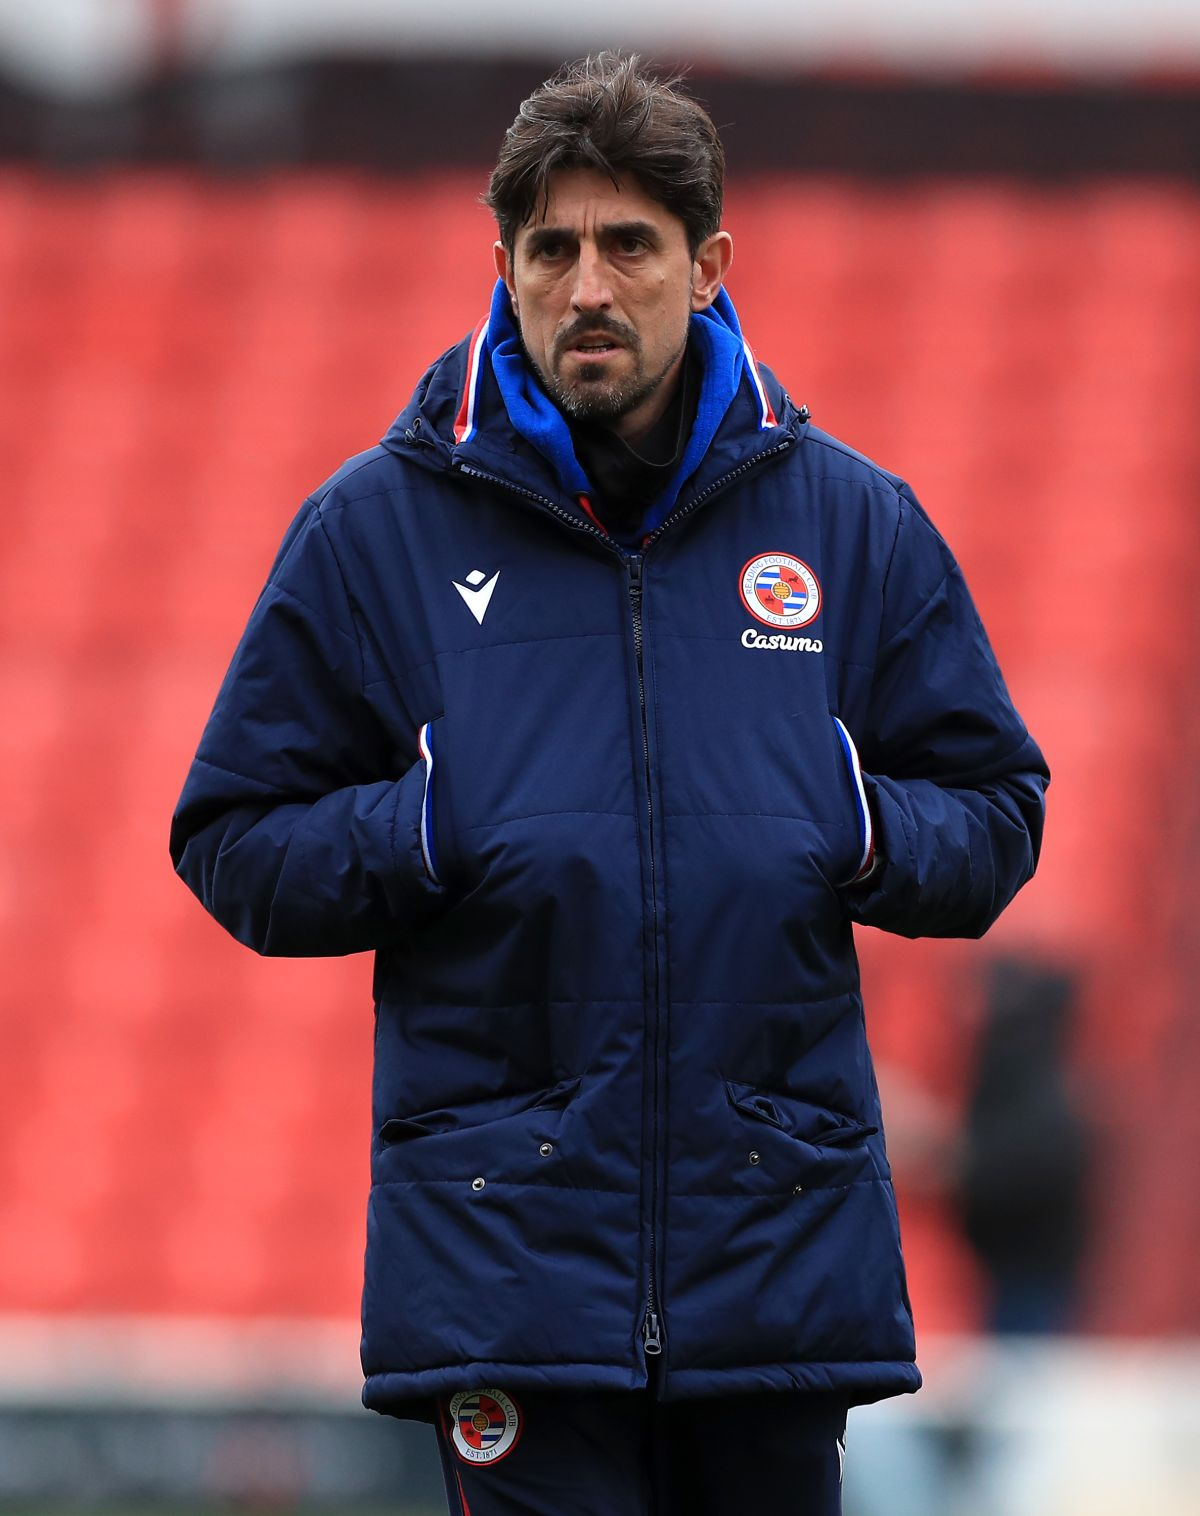 Reading will keep pounding away in Championship play-off bid – Veljko Paunovic